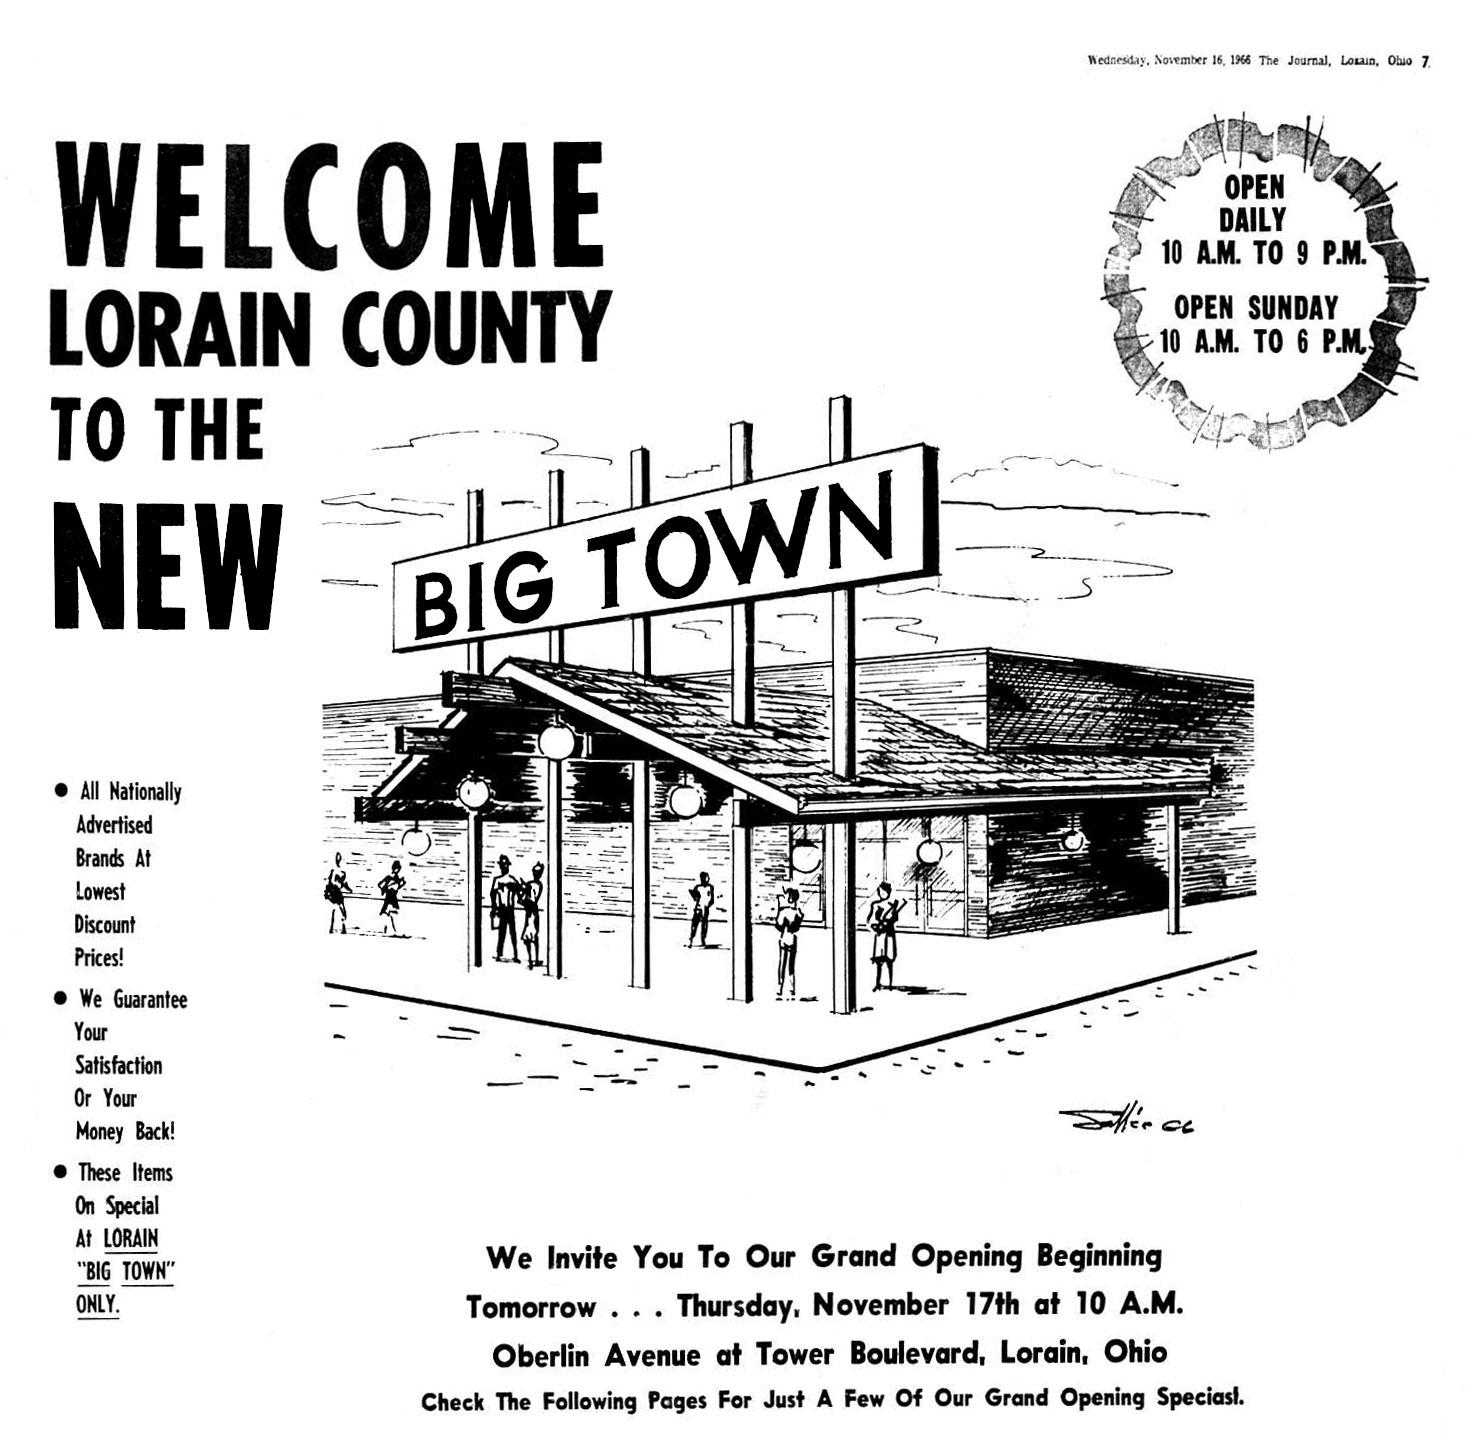 Brady S Bunch Of Lorain County Nostalgia Big Town And Big